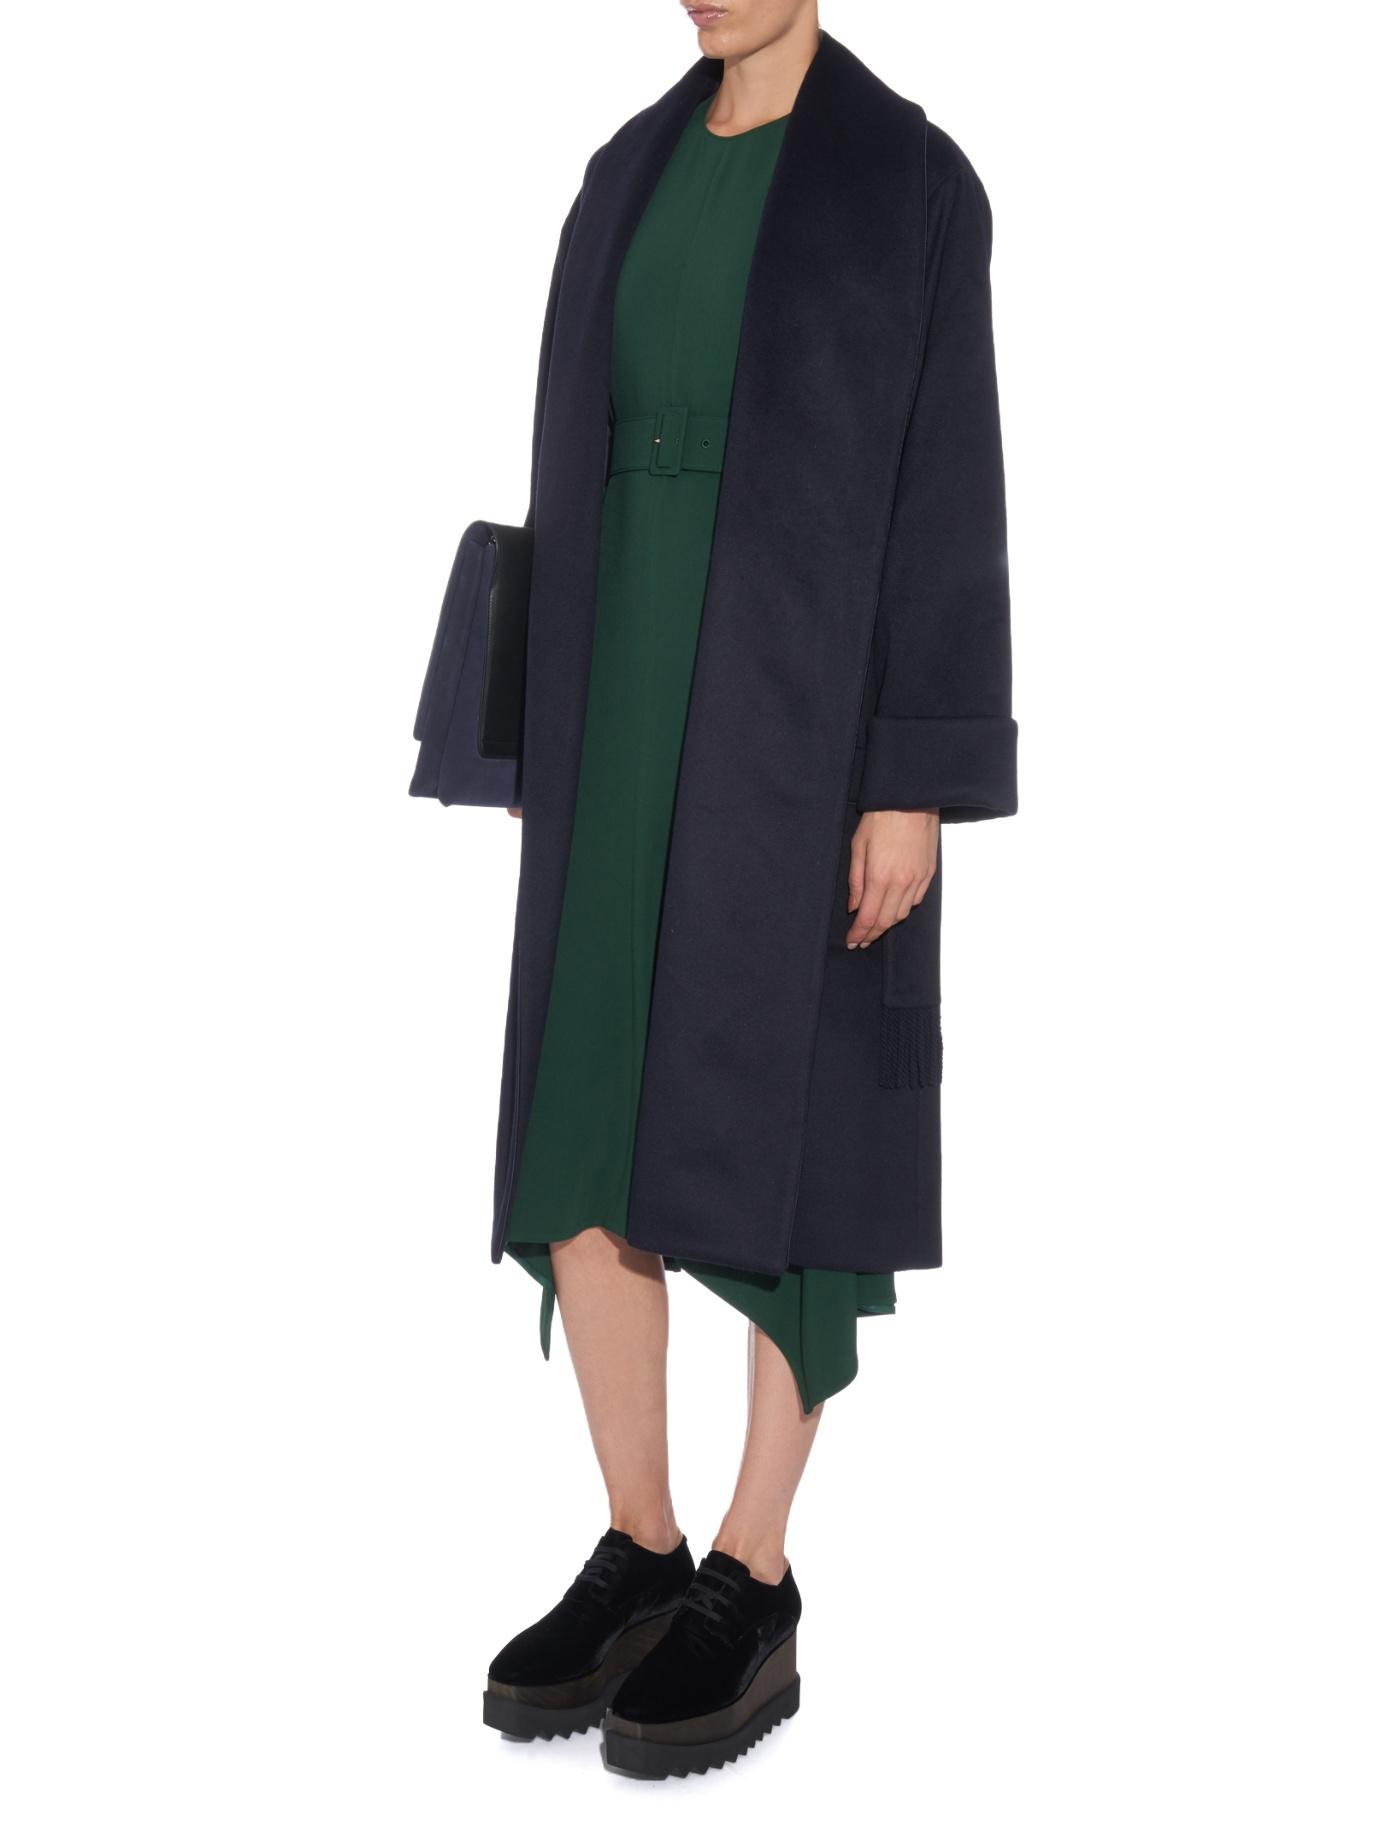 Lyst Stella Mccartney Elyse Lace Up Platform Shoes In Black